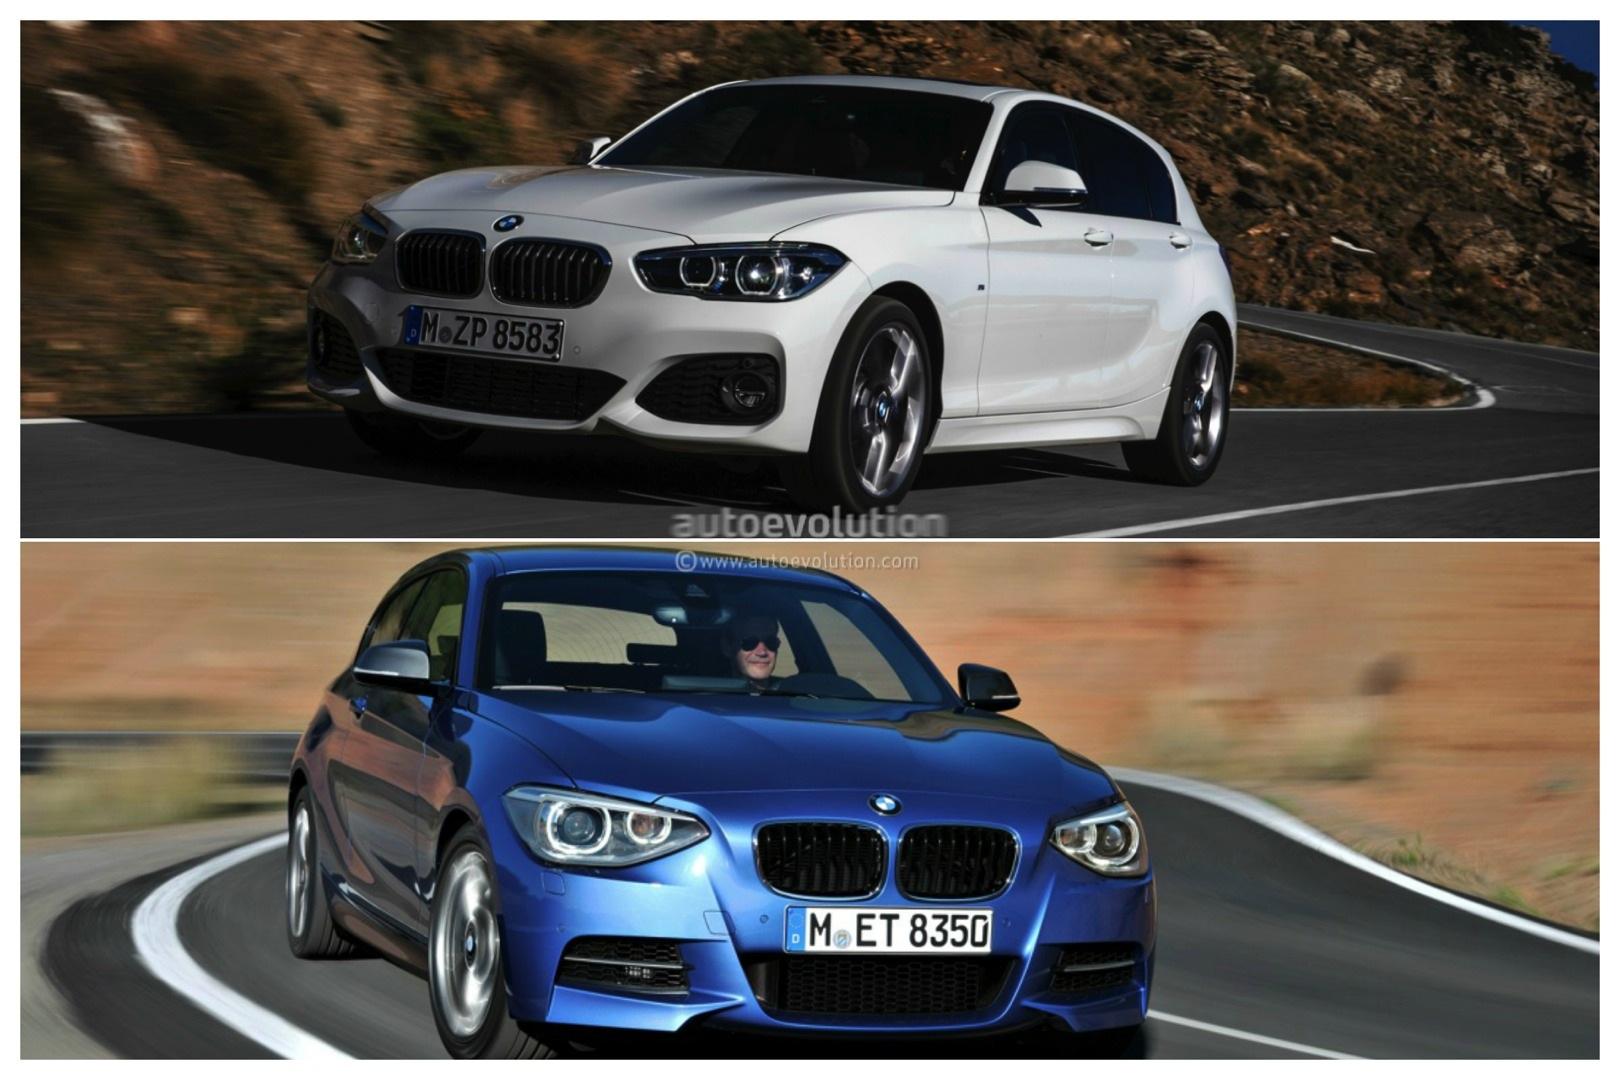 Photo Comparison Bmw F20 1 Series Facelift Versus Bmw F20 1 Series